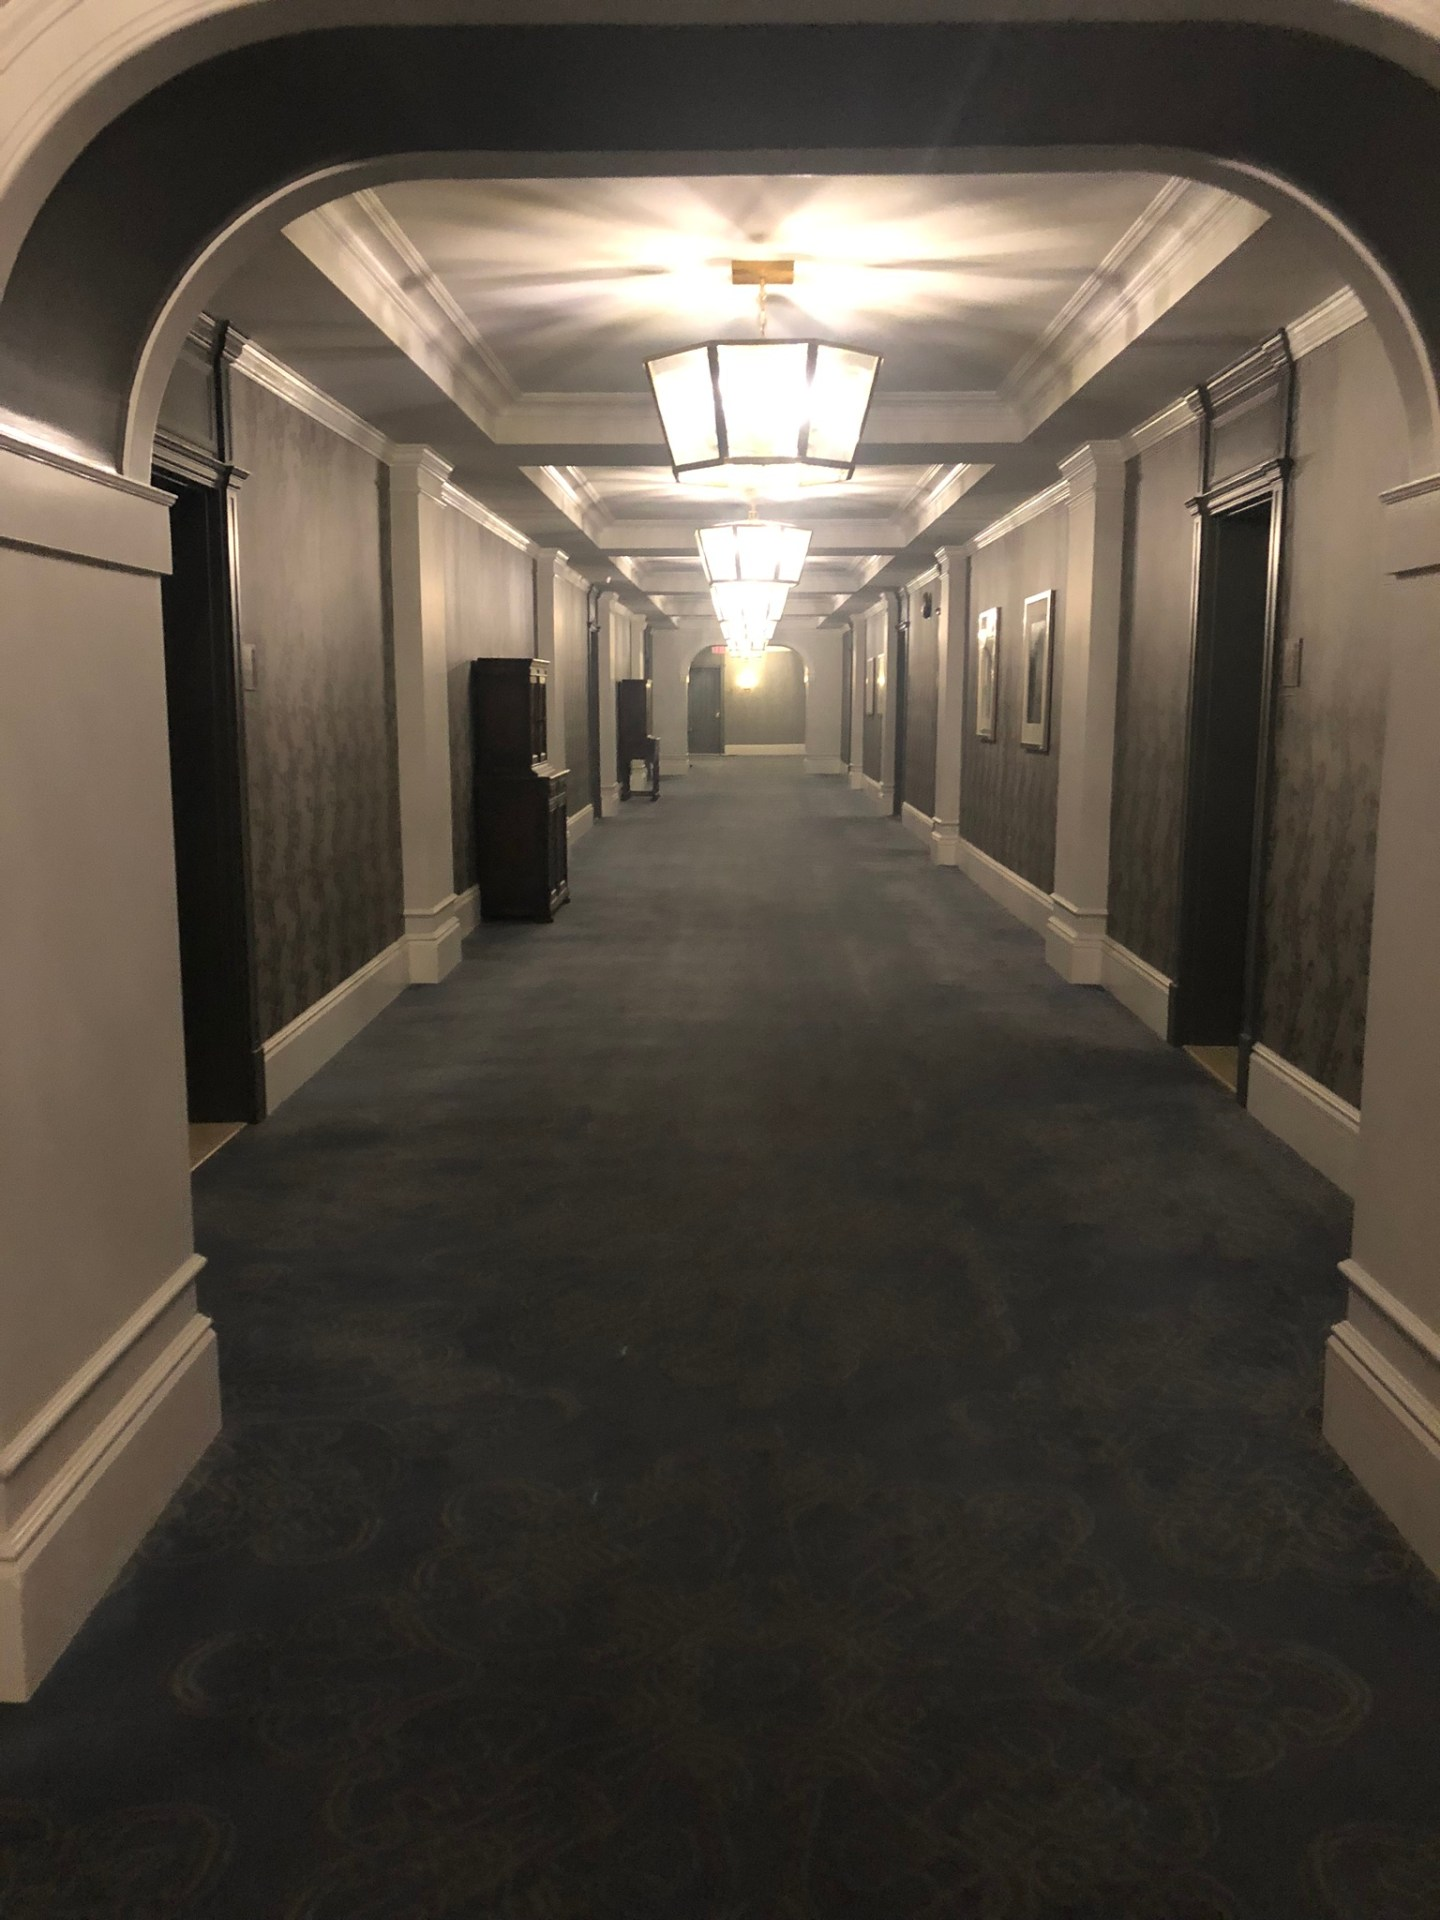 Corridor at the Fairmont Empress, Victoria